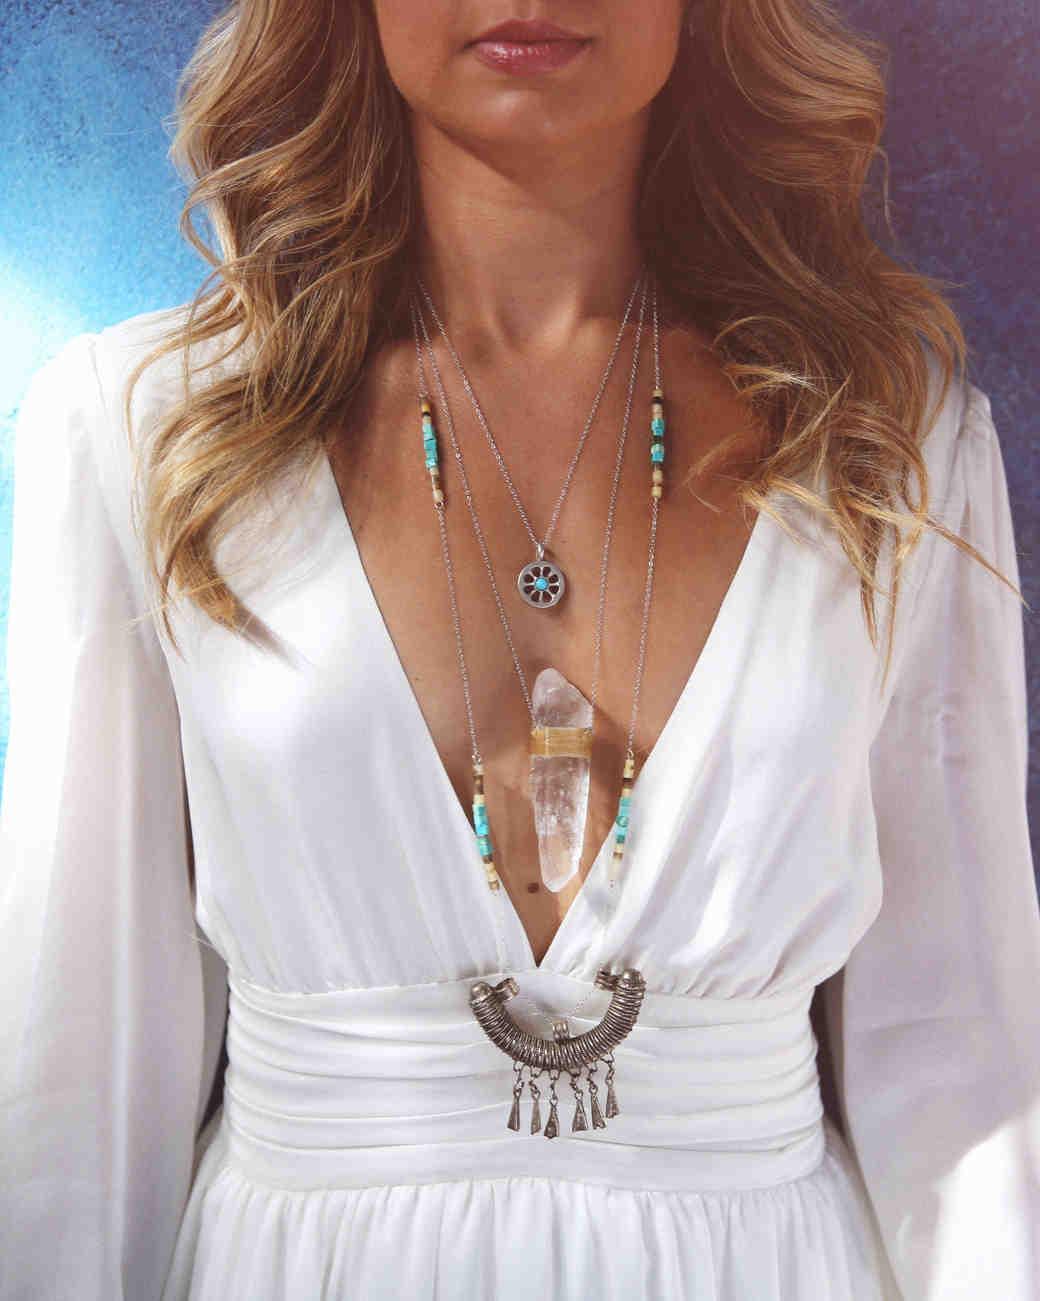 christen-billy-wedding-jewelry-007-011-s111597-1014.jpg